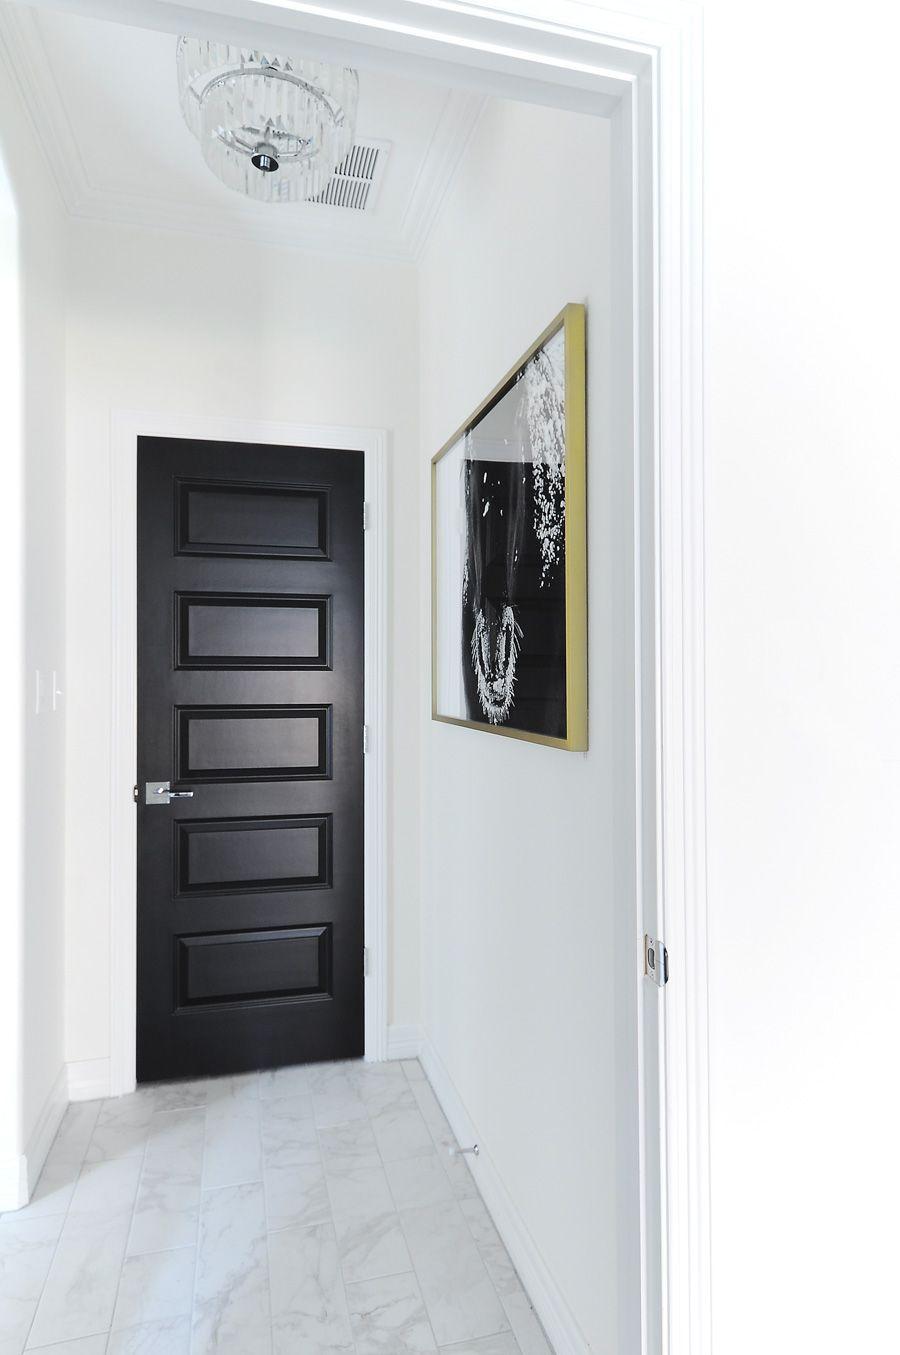 Modern Interior Doors Ideas 30: Living With Black Interior Doors: 6 Month Update